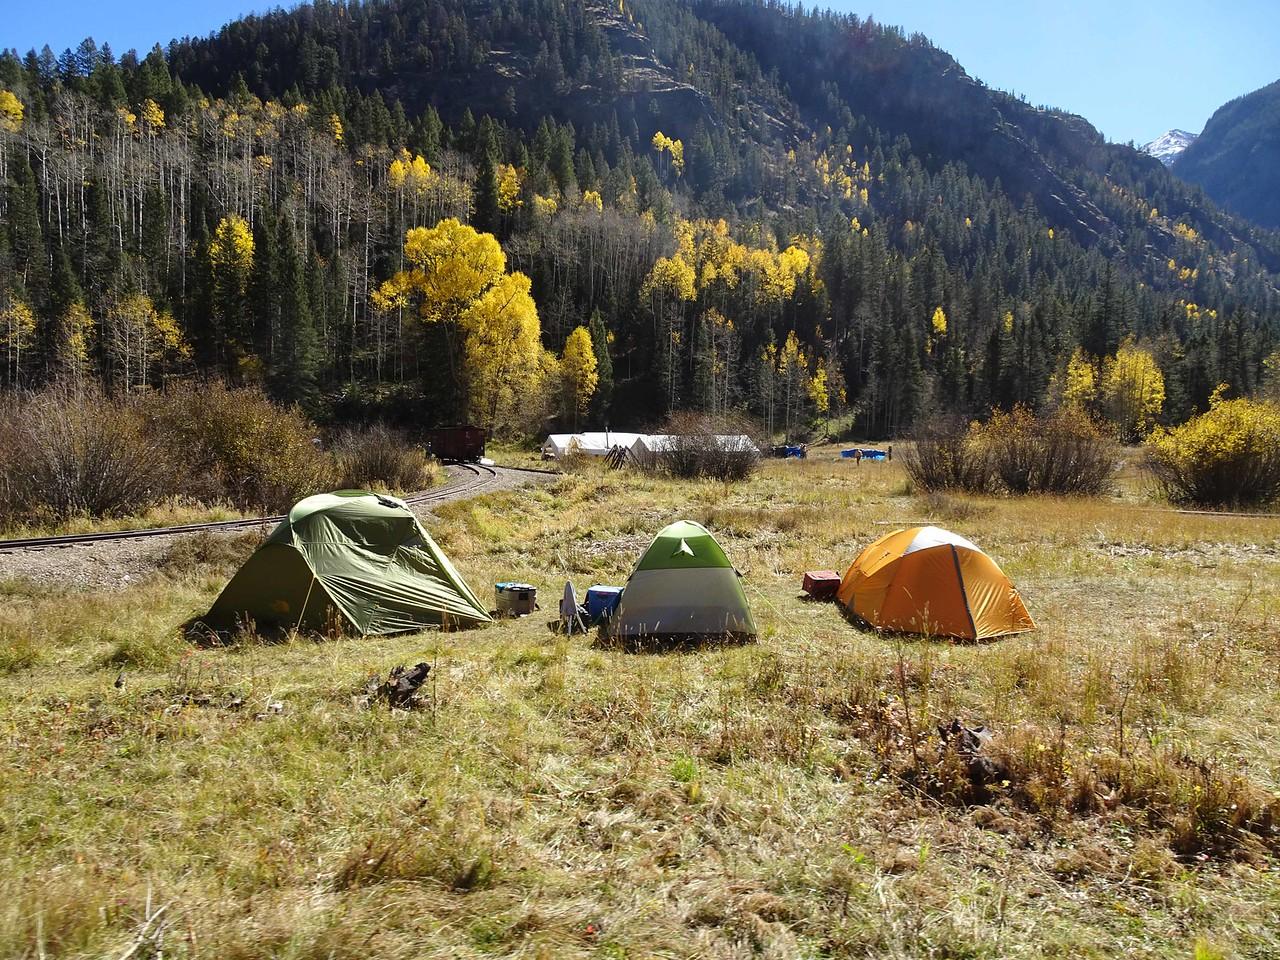 131 Hunters tents